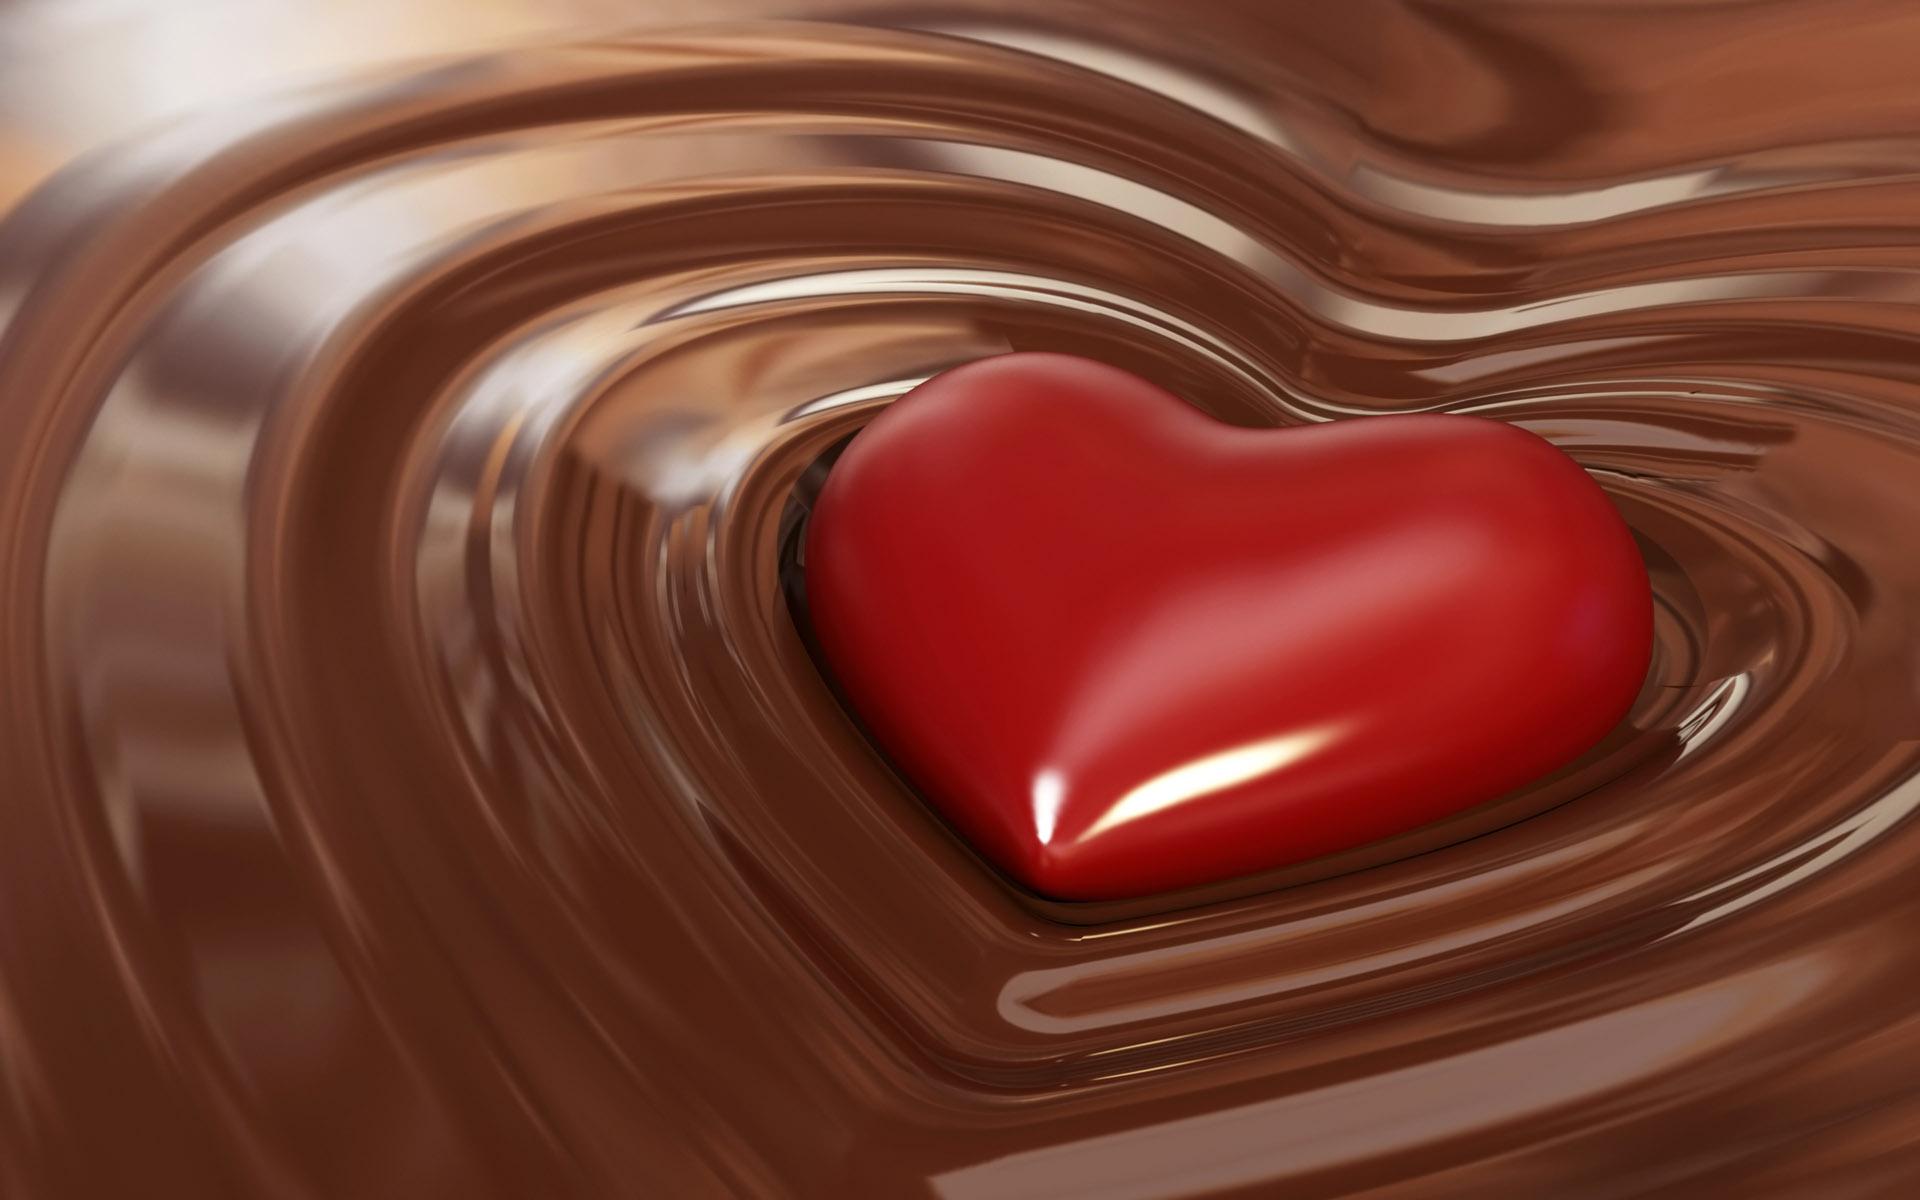 Chocolate   Wallpapers Pictures Pics Photos Images Desktop 1920x1200